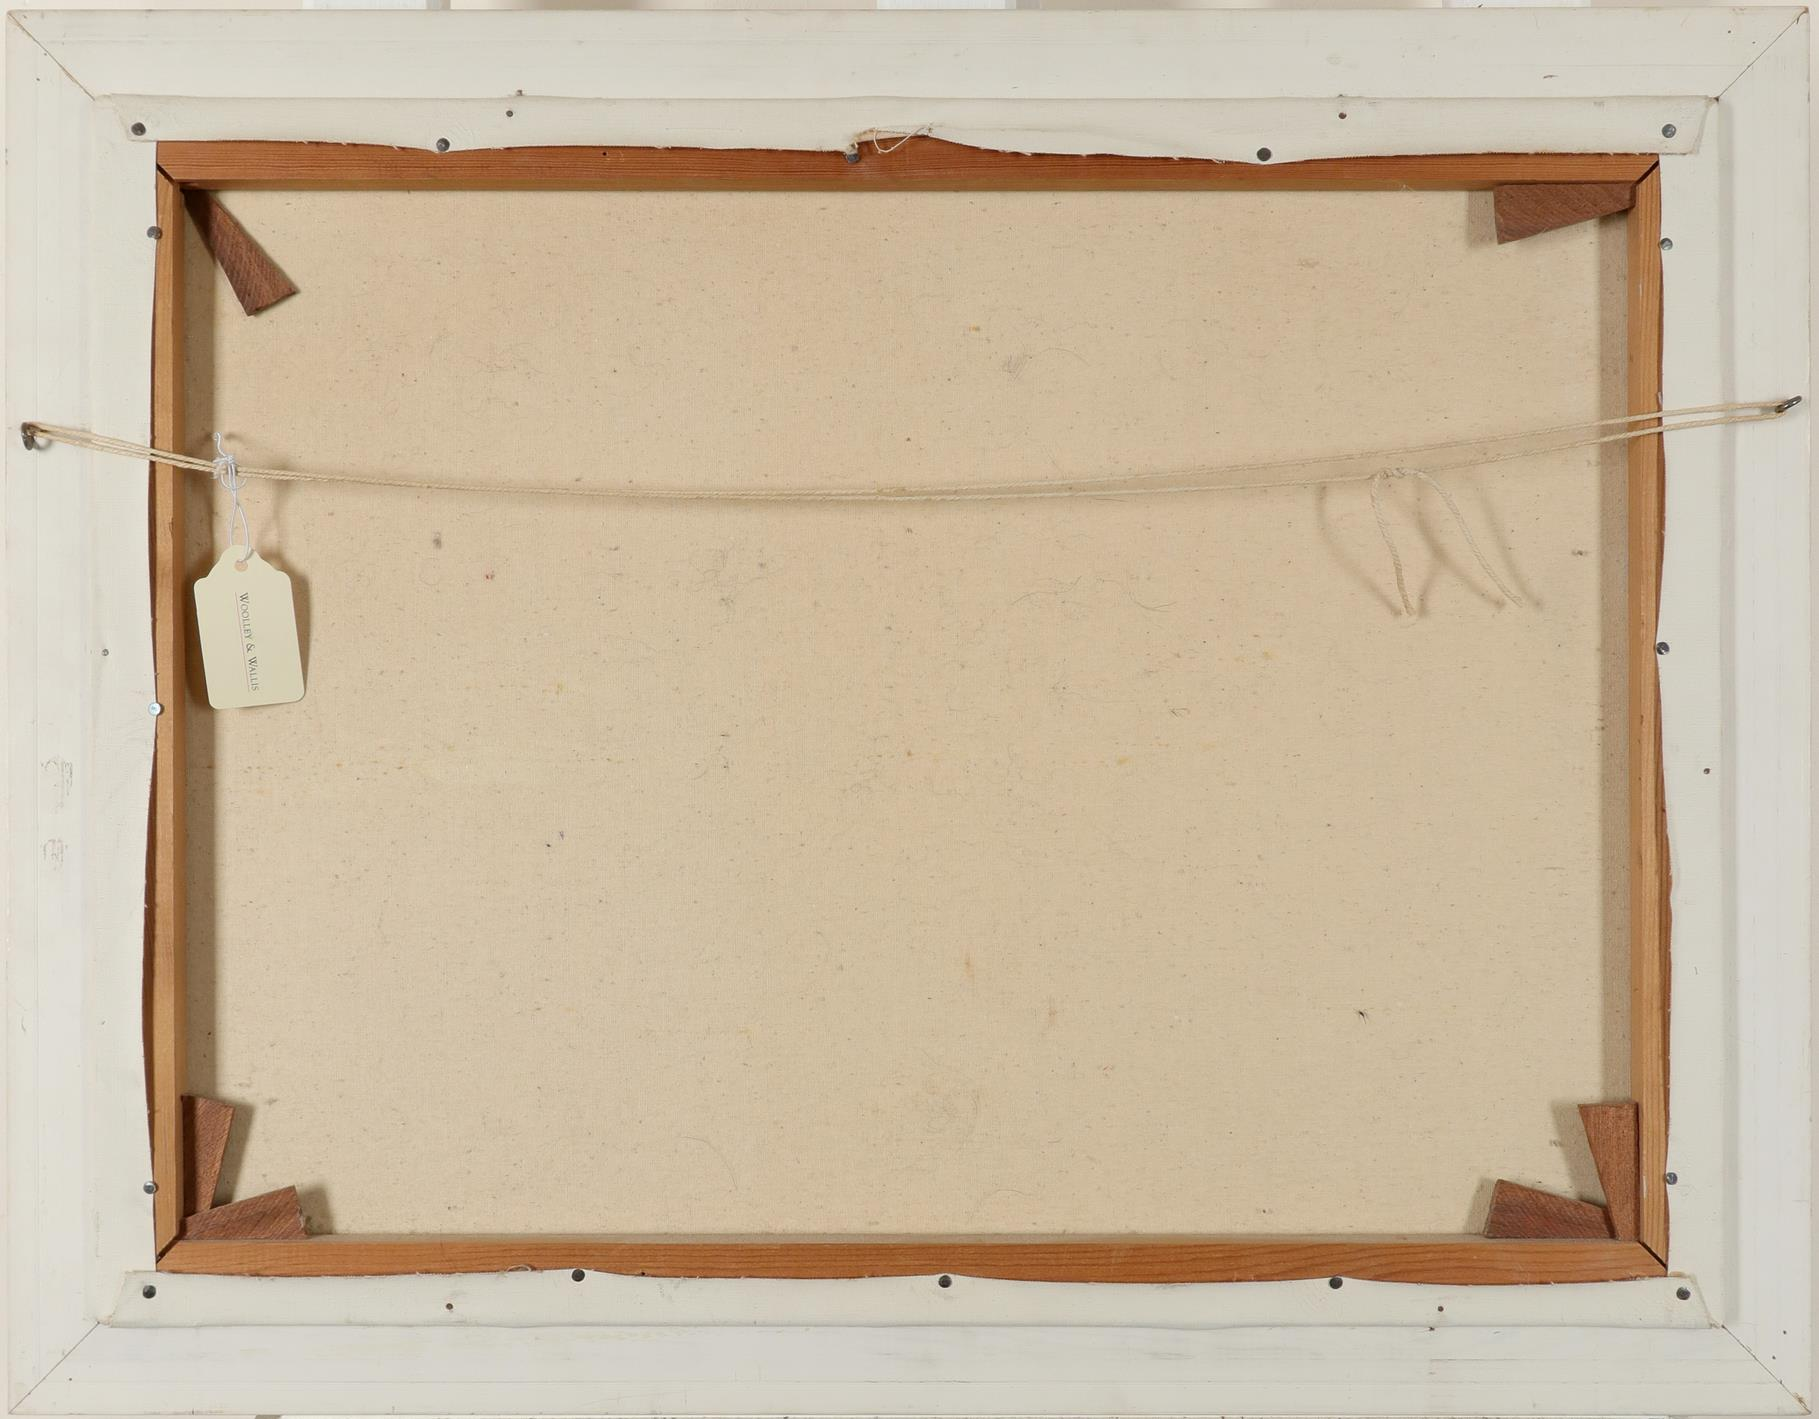 ‡Howard Devonald (20th Century) Landscape at dawn Signed Howard Devonald (lower left) Oil on - Image 3 of 3